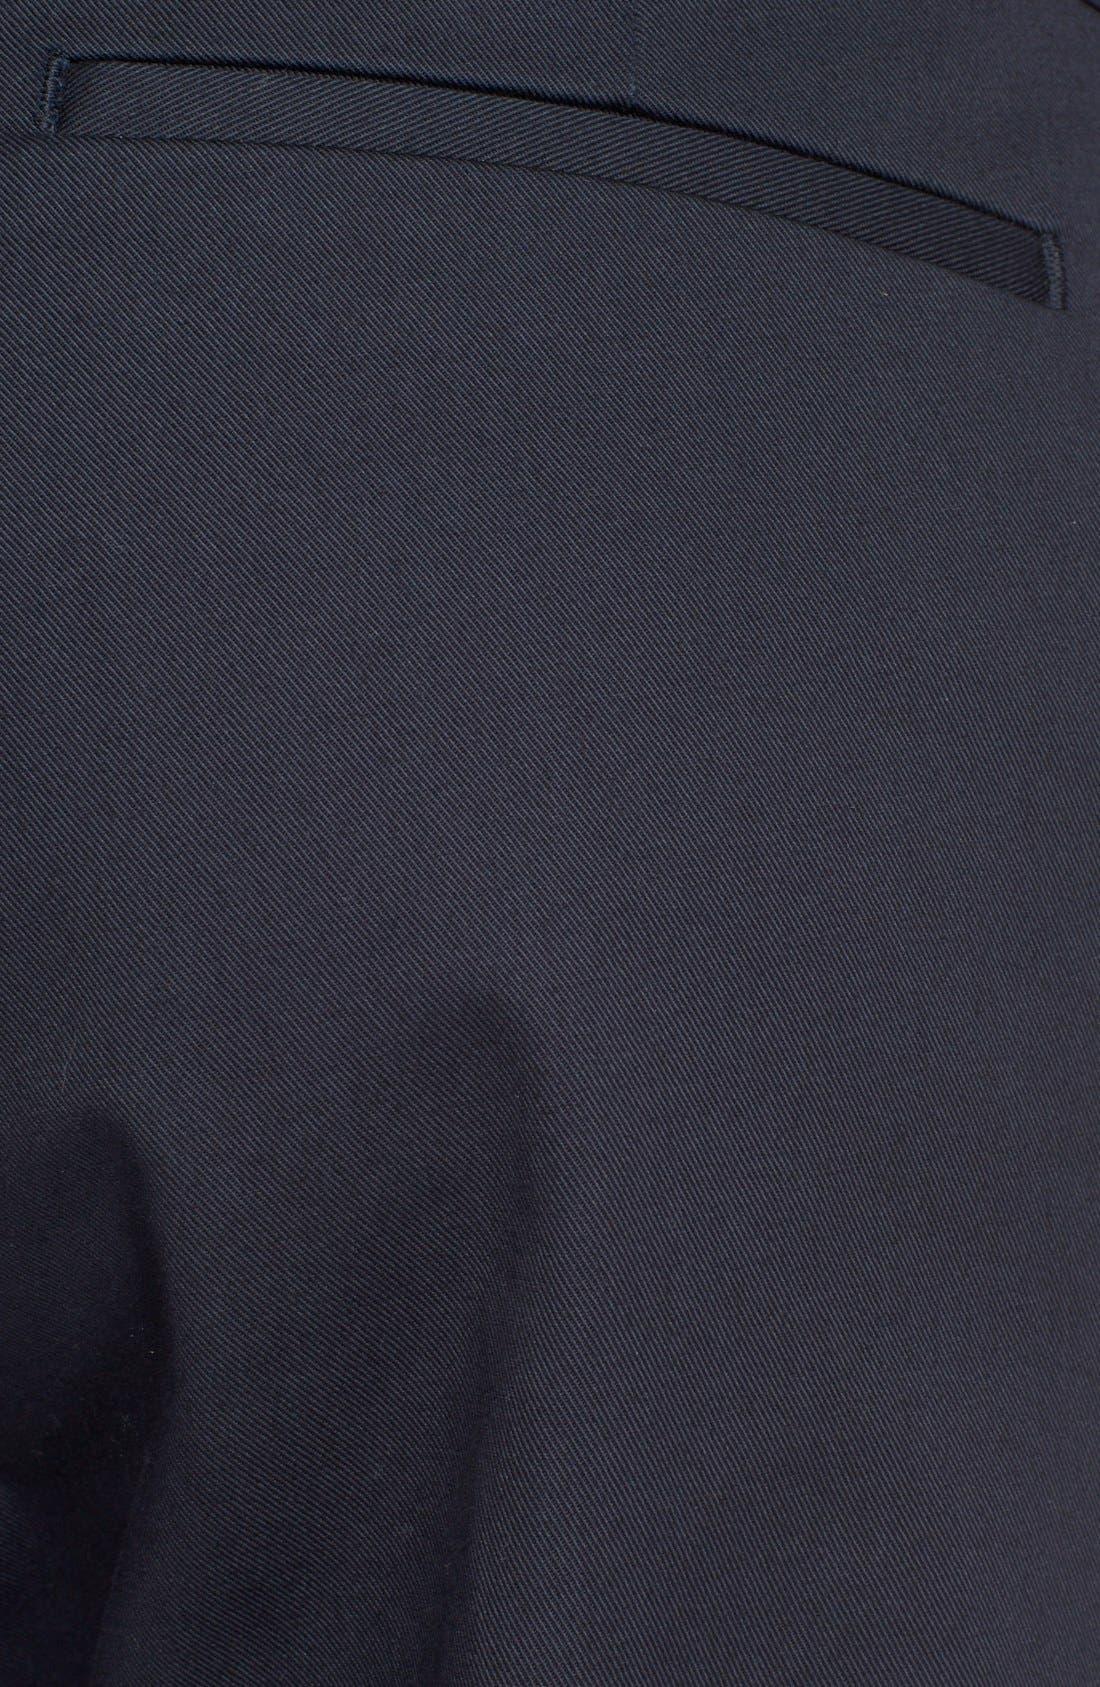 Pleated Cotton Pants,                             Alternate thumbnail 3, color,                             410